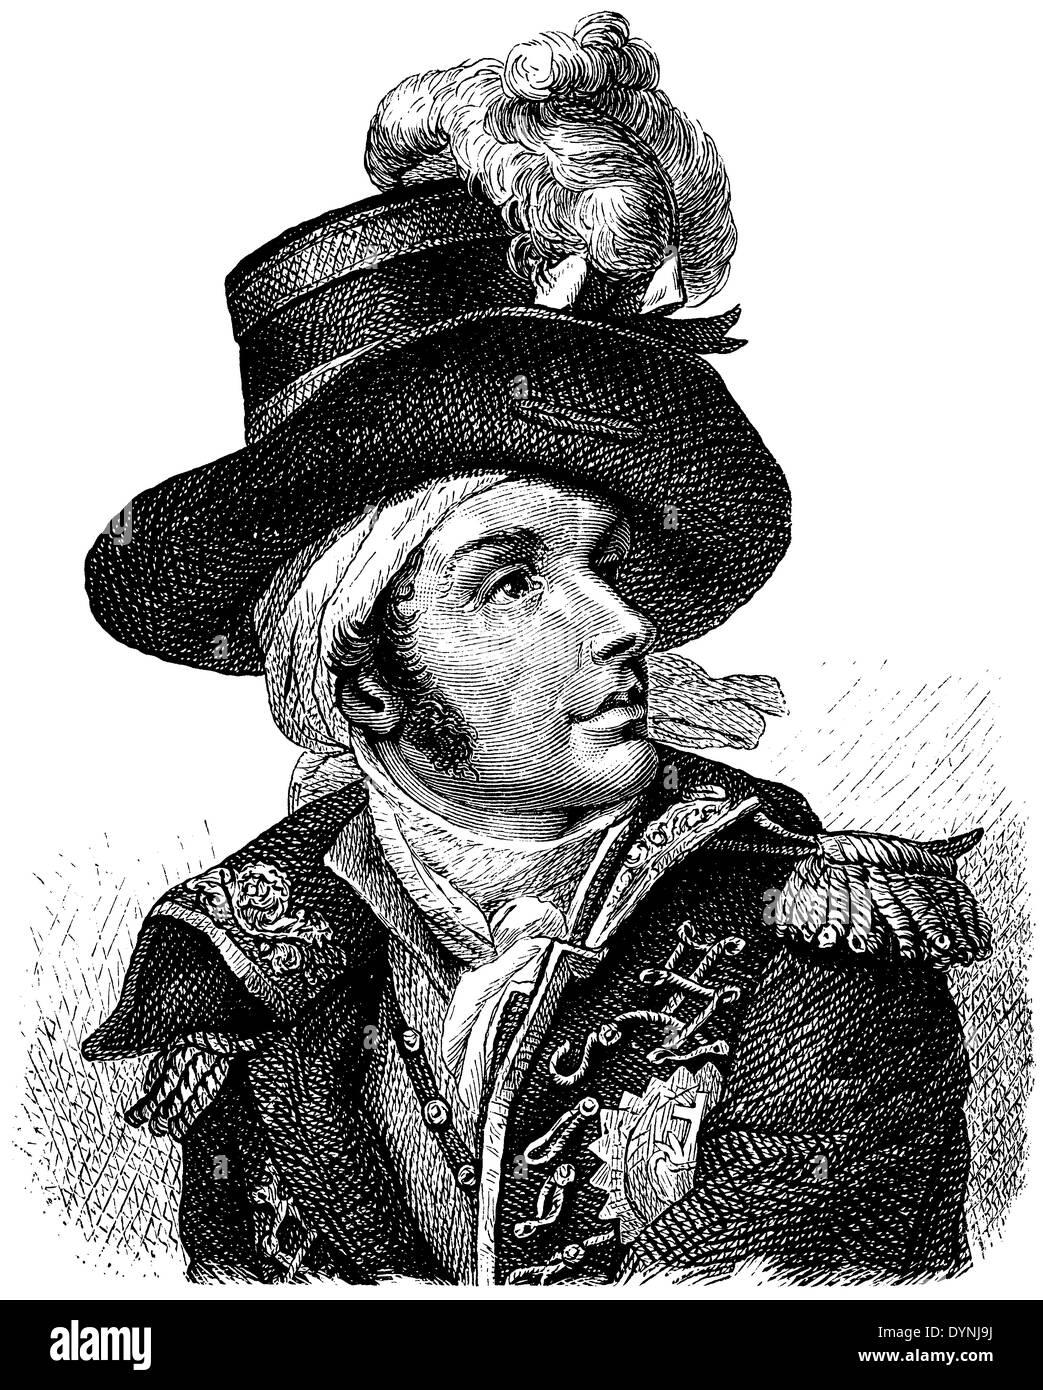 François de Charette - Wikipedia, la enciclopedia libre